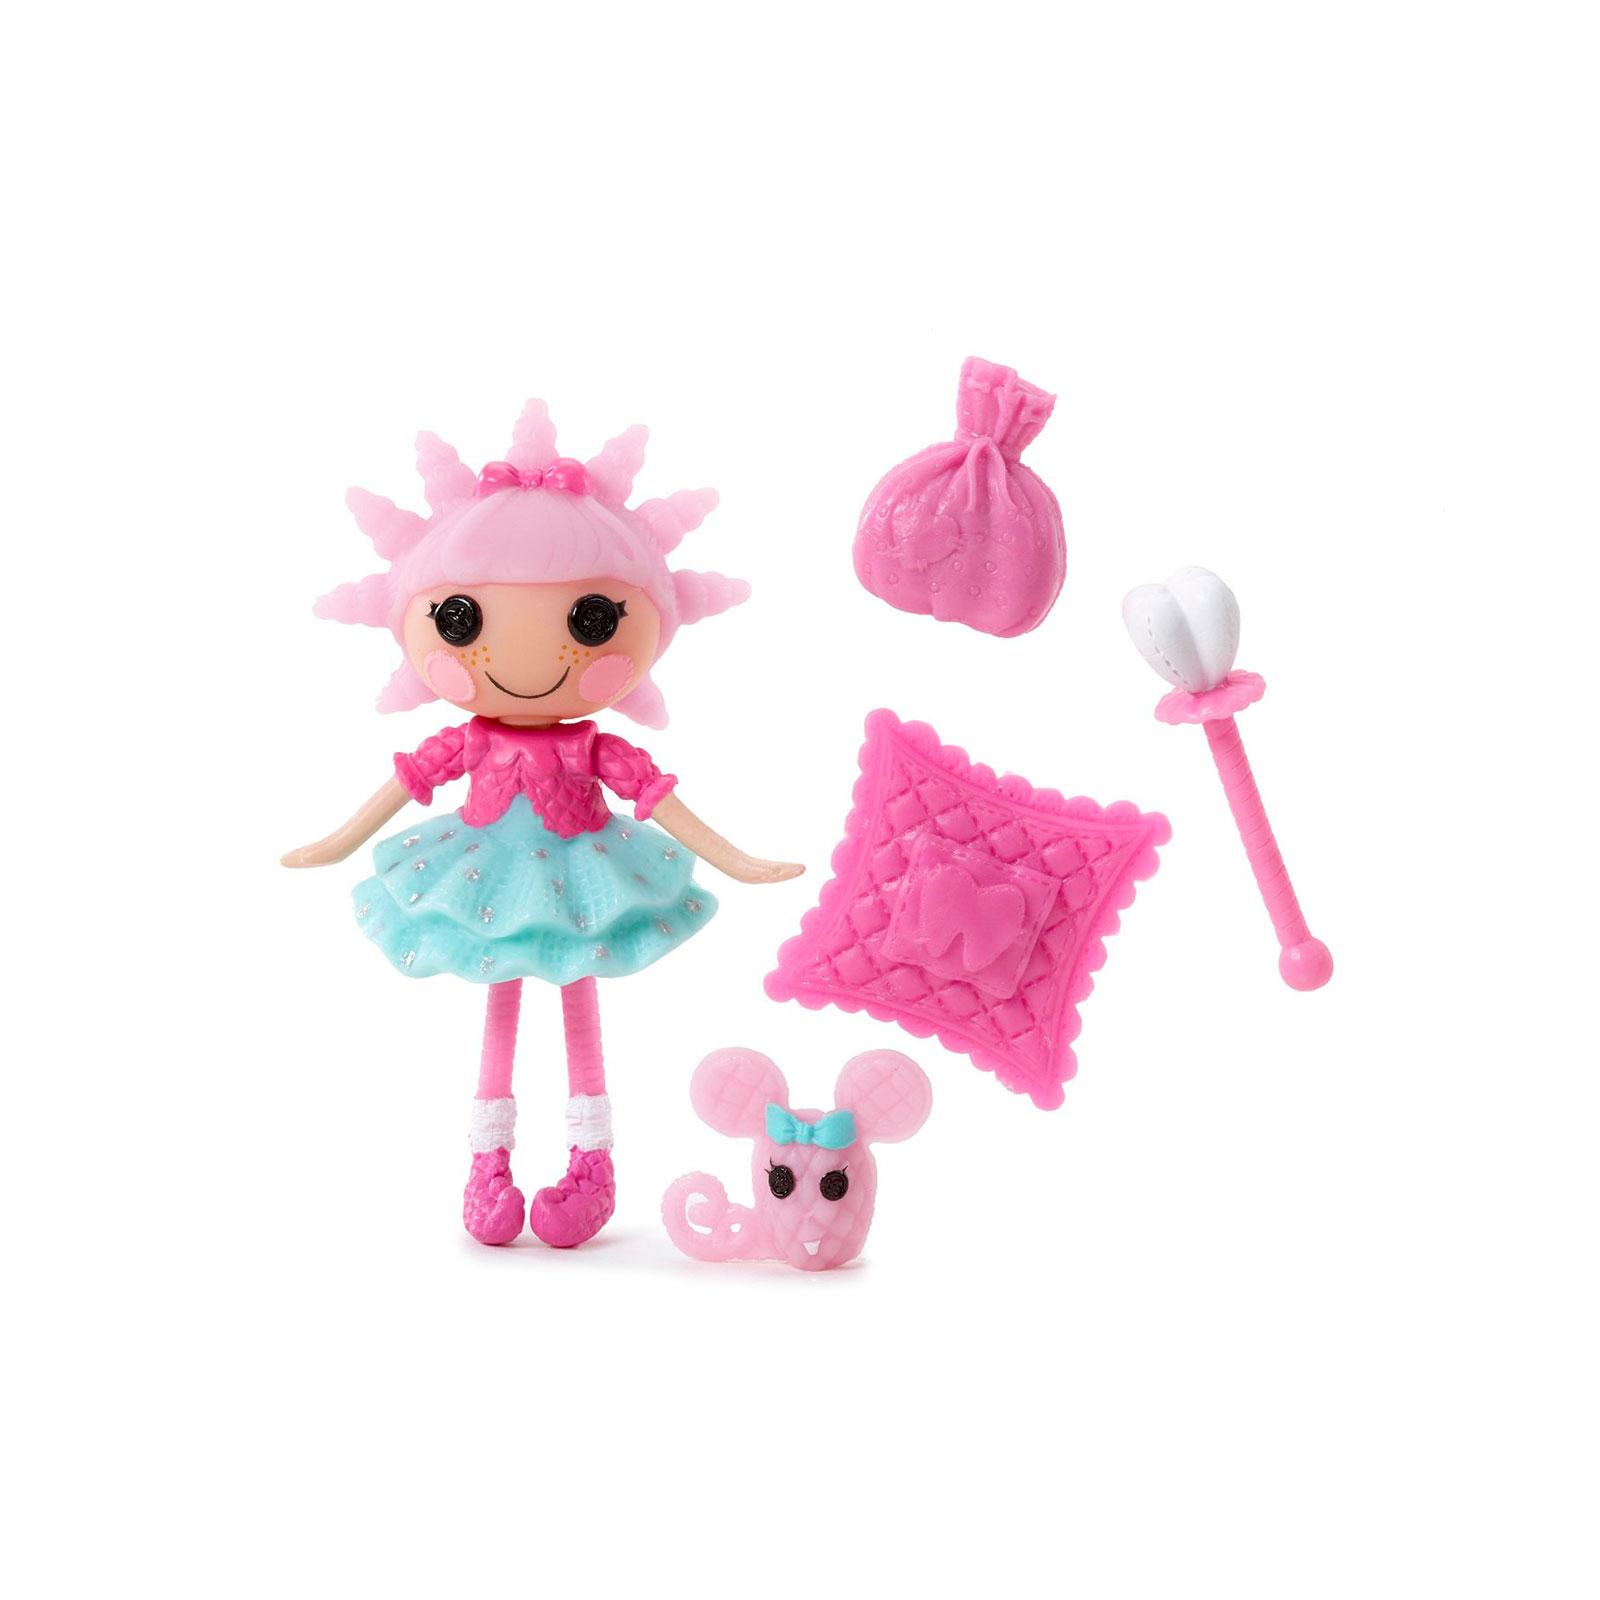 Кукла Mini Lalaloopsy с аксессуарами Smile E. Wishes<br>